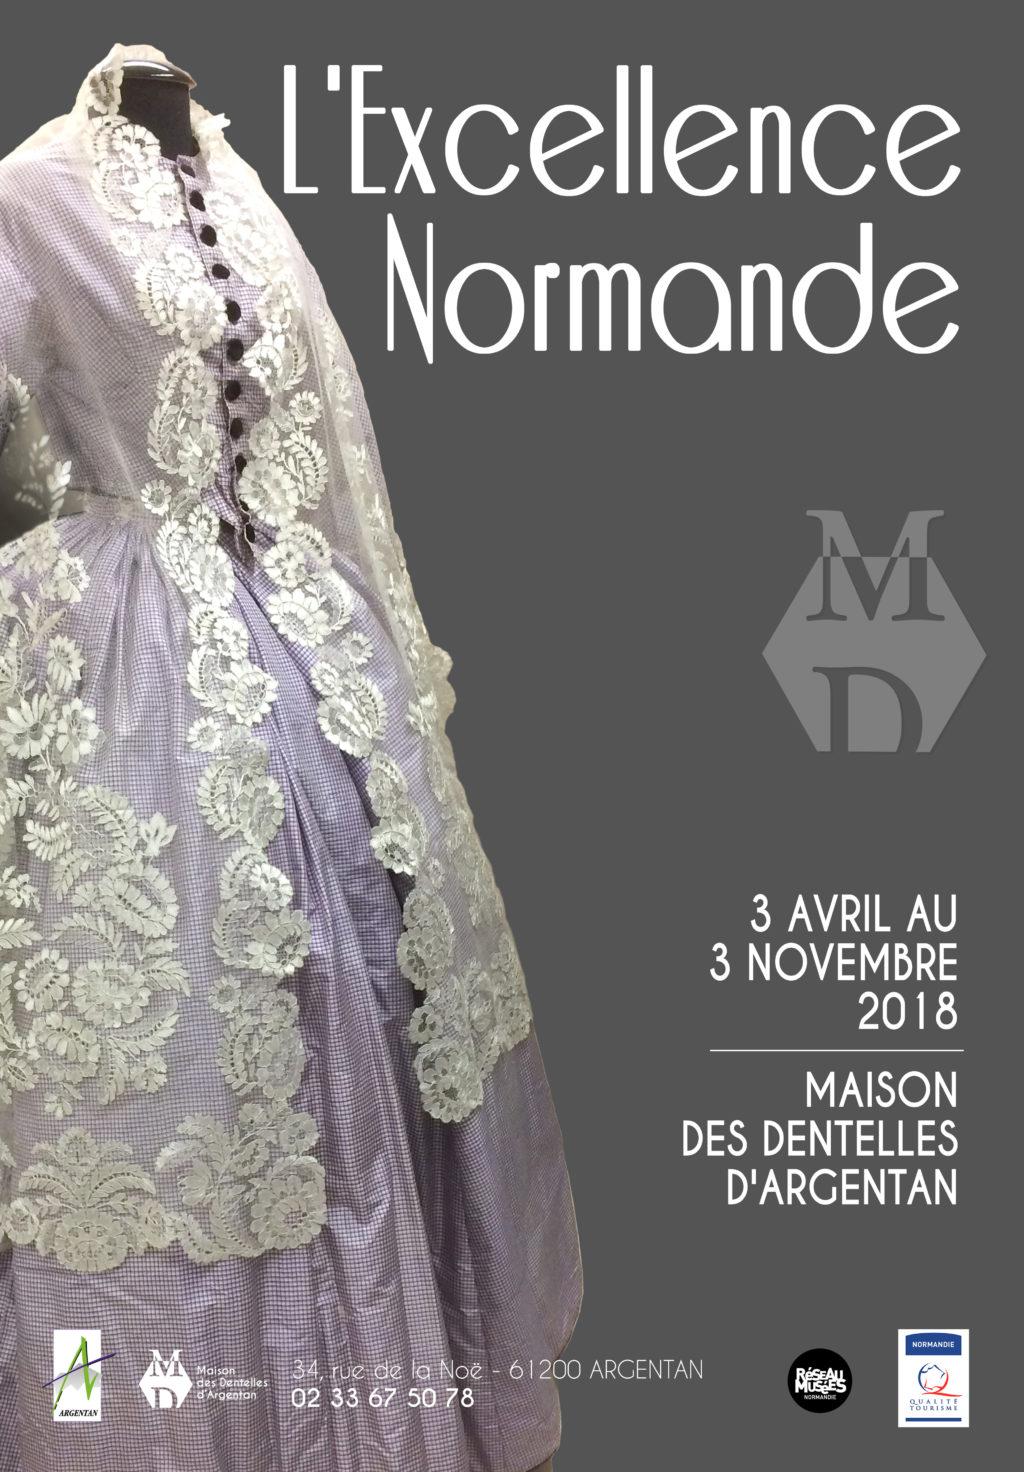 Exposition L'excellence normande · Argentan